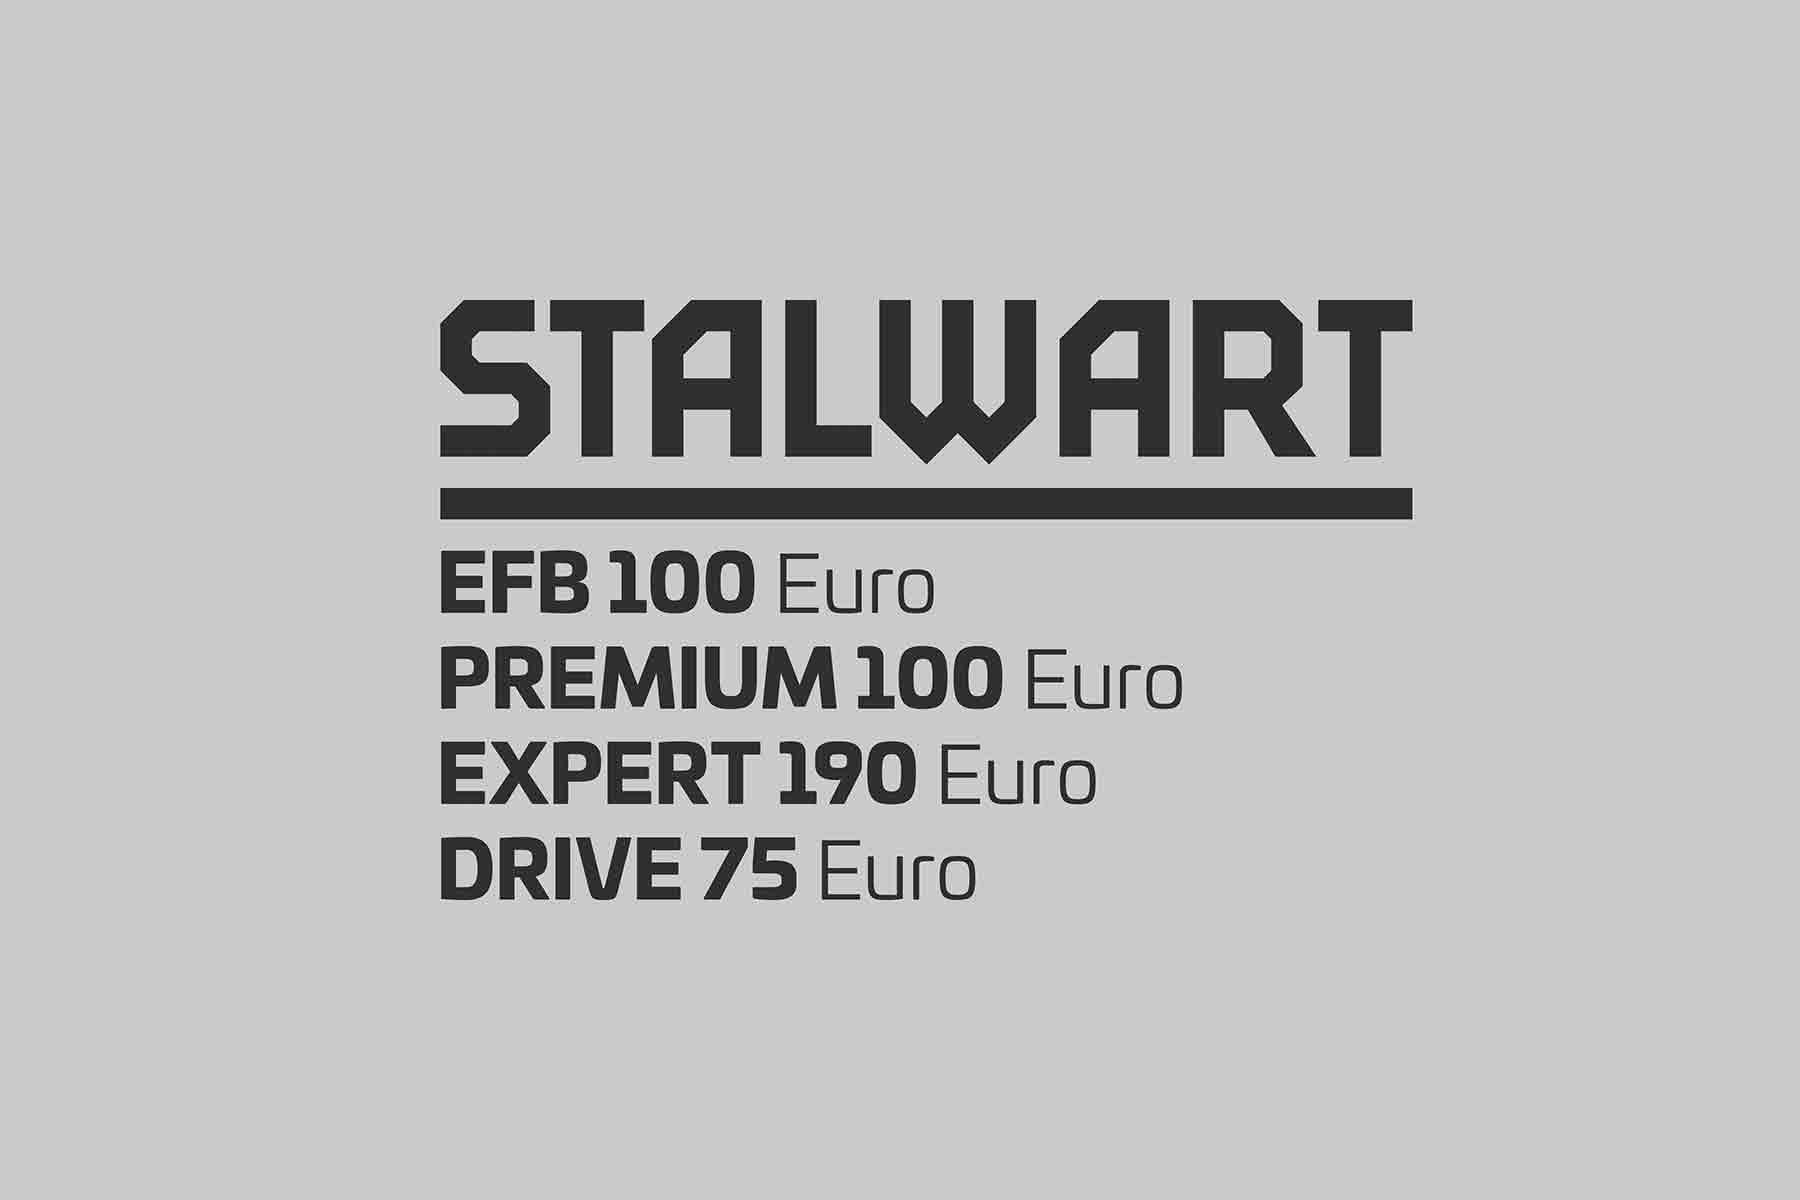 Stalwart-01.jpg